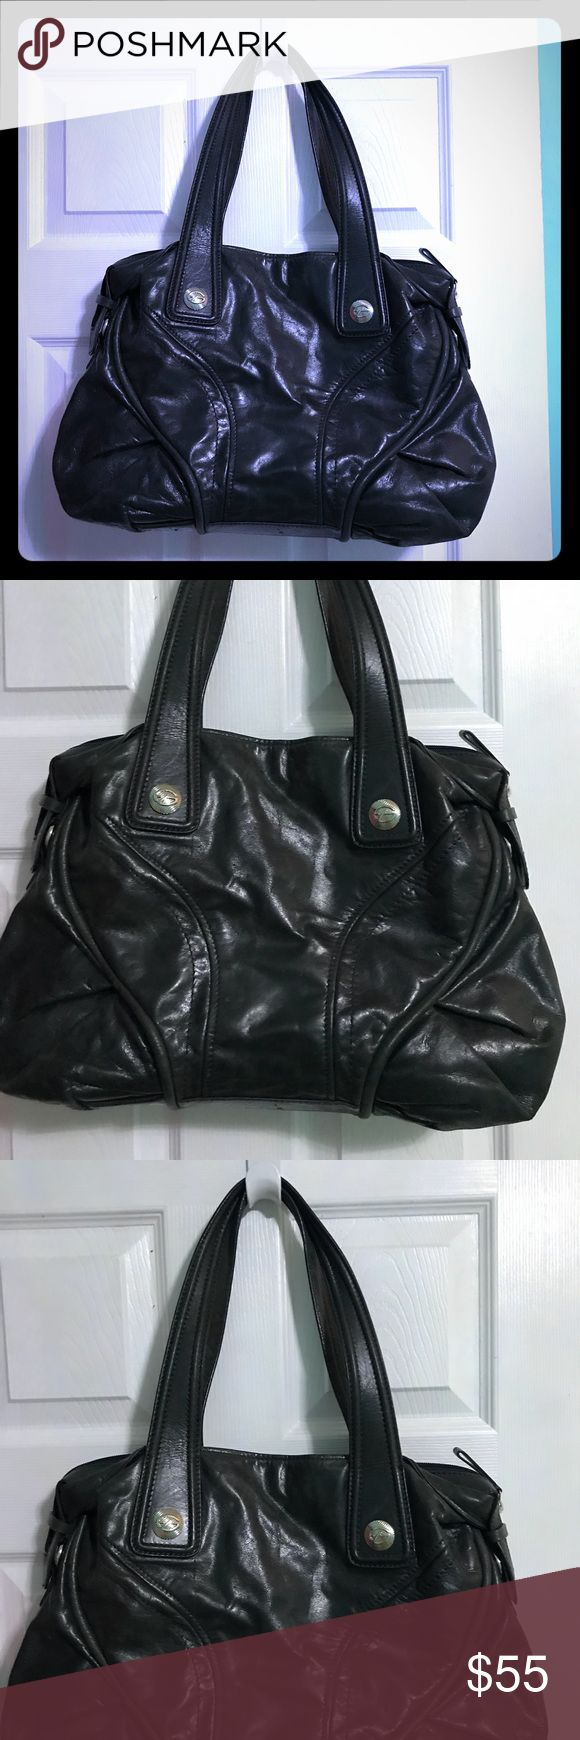 "Large Francesco Biasia Calf Leather Satchel Excellent pre-owned condition. 100% calf leather. 17""x10"". Francesco Biasia Bags Satchels"